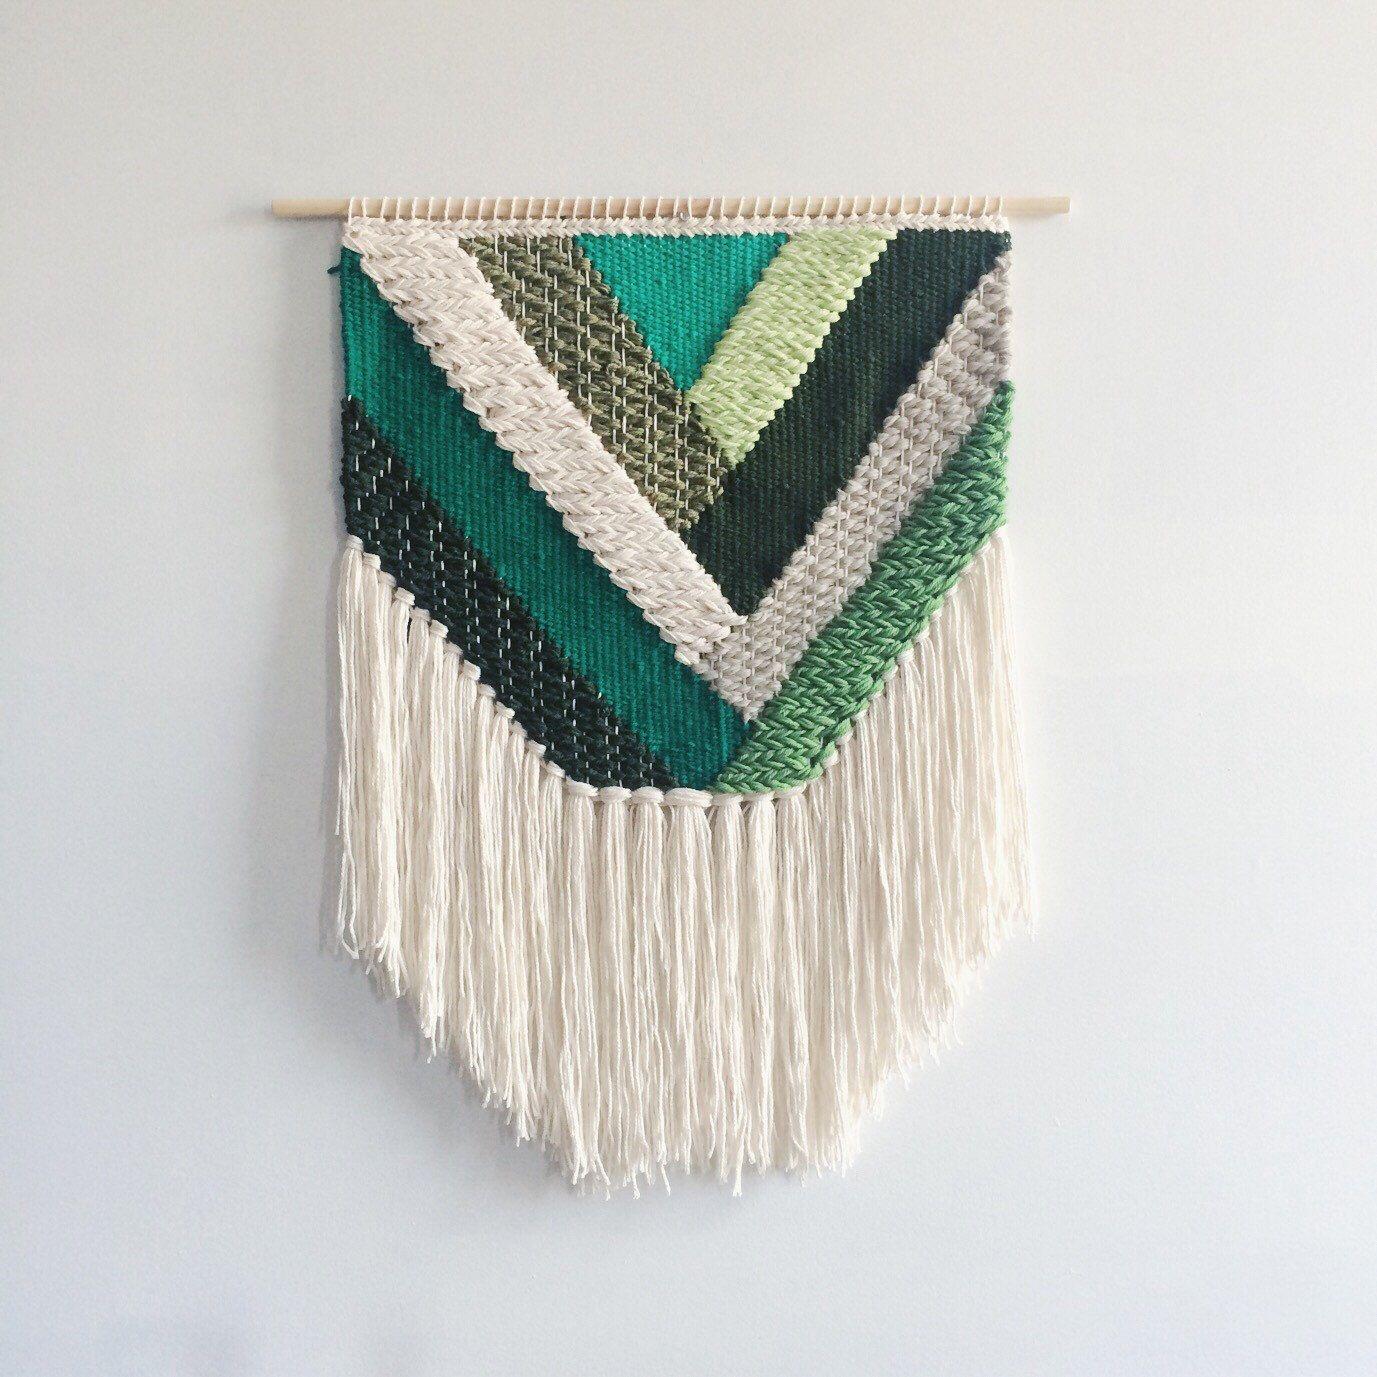 Emerald Geometric Weaving | Hand Woven Wall Hanging Pertaining To 2017 Hand Woven Wall Hangings (View 2 of 20)